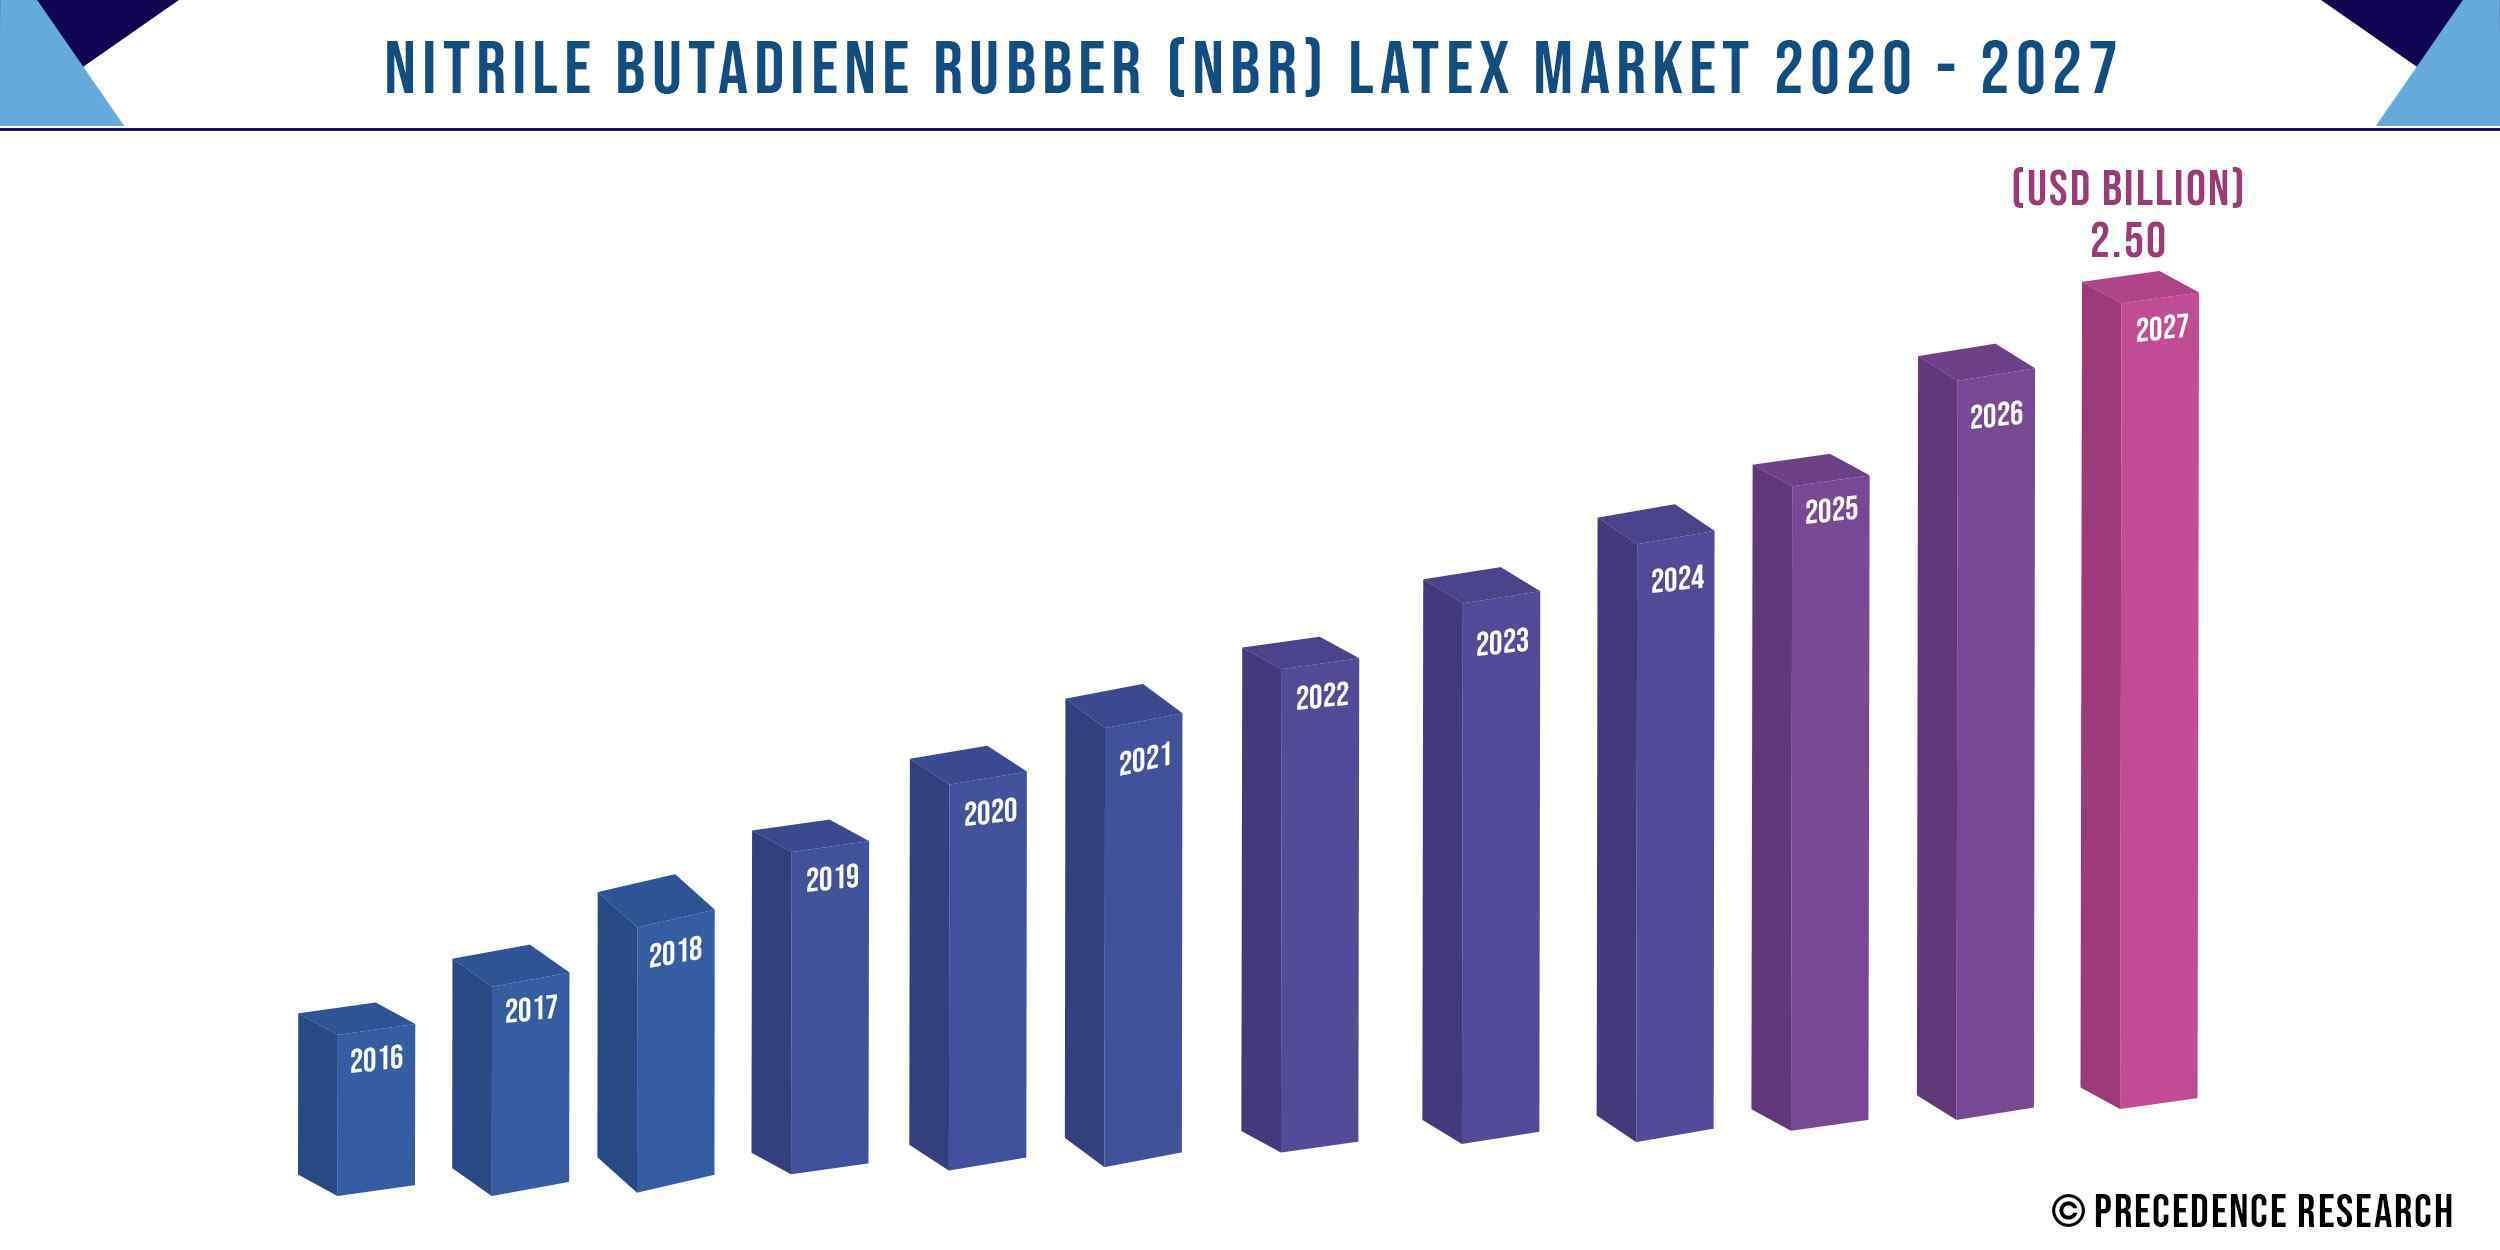 Nitrile Butadiene Rubber Latex Market Size 2019-2027